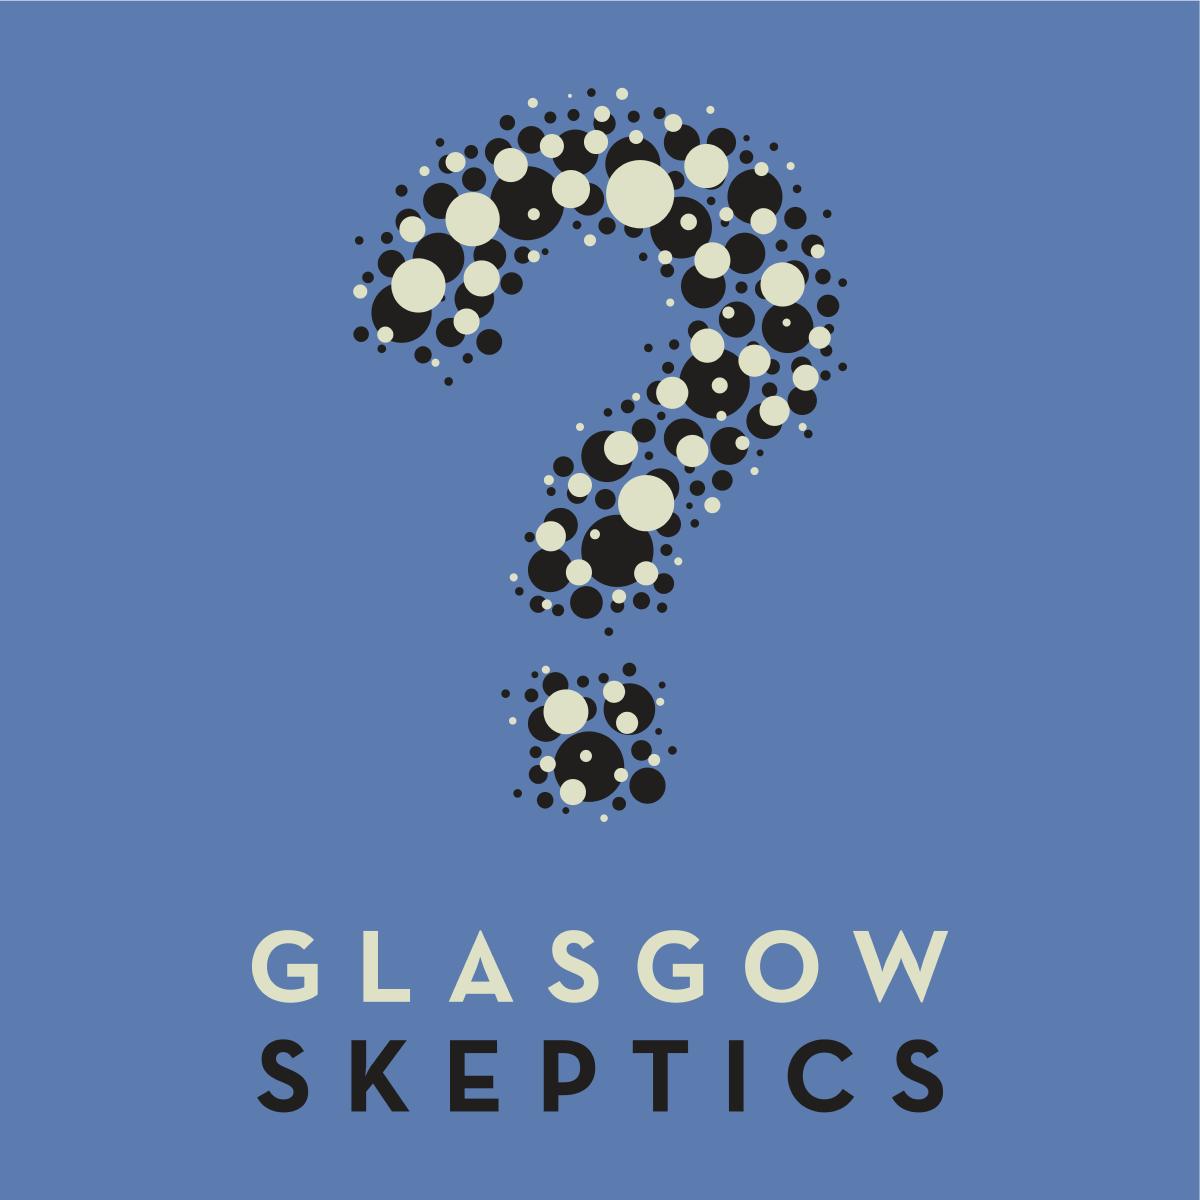 Glasgow Skeptics